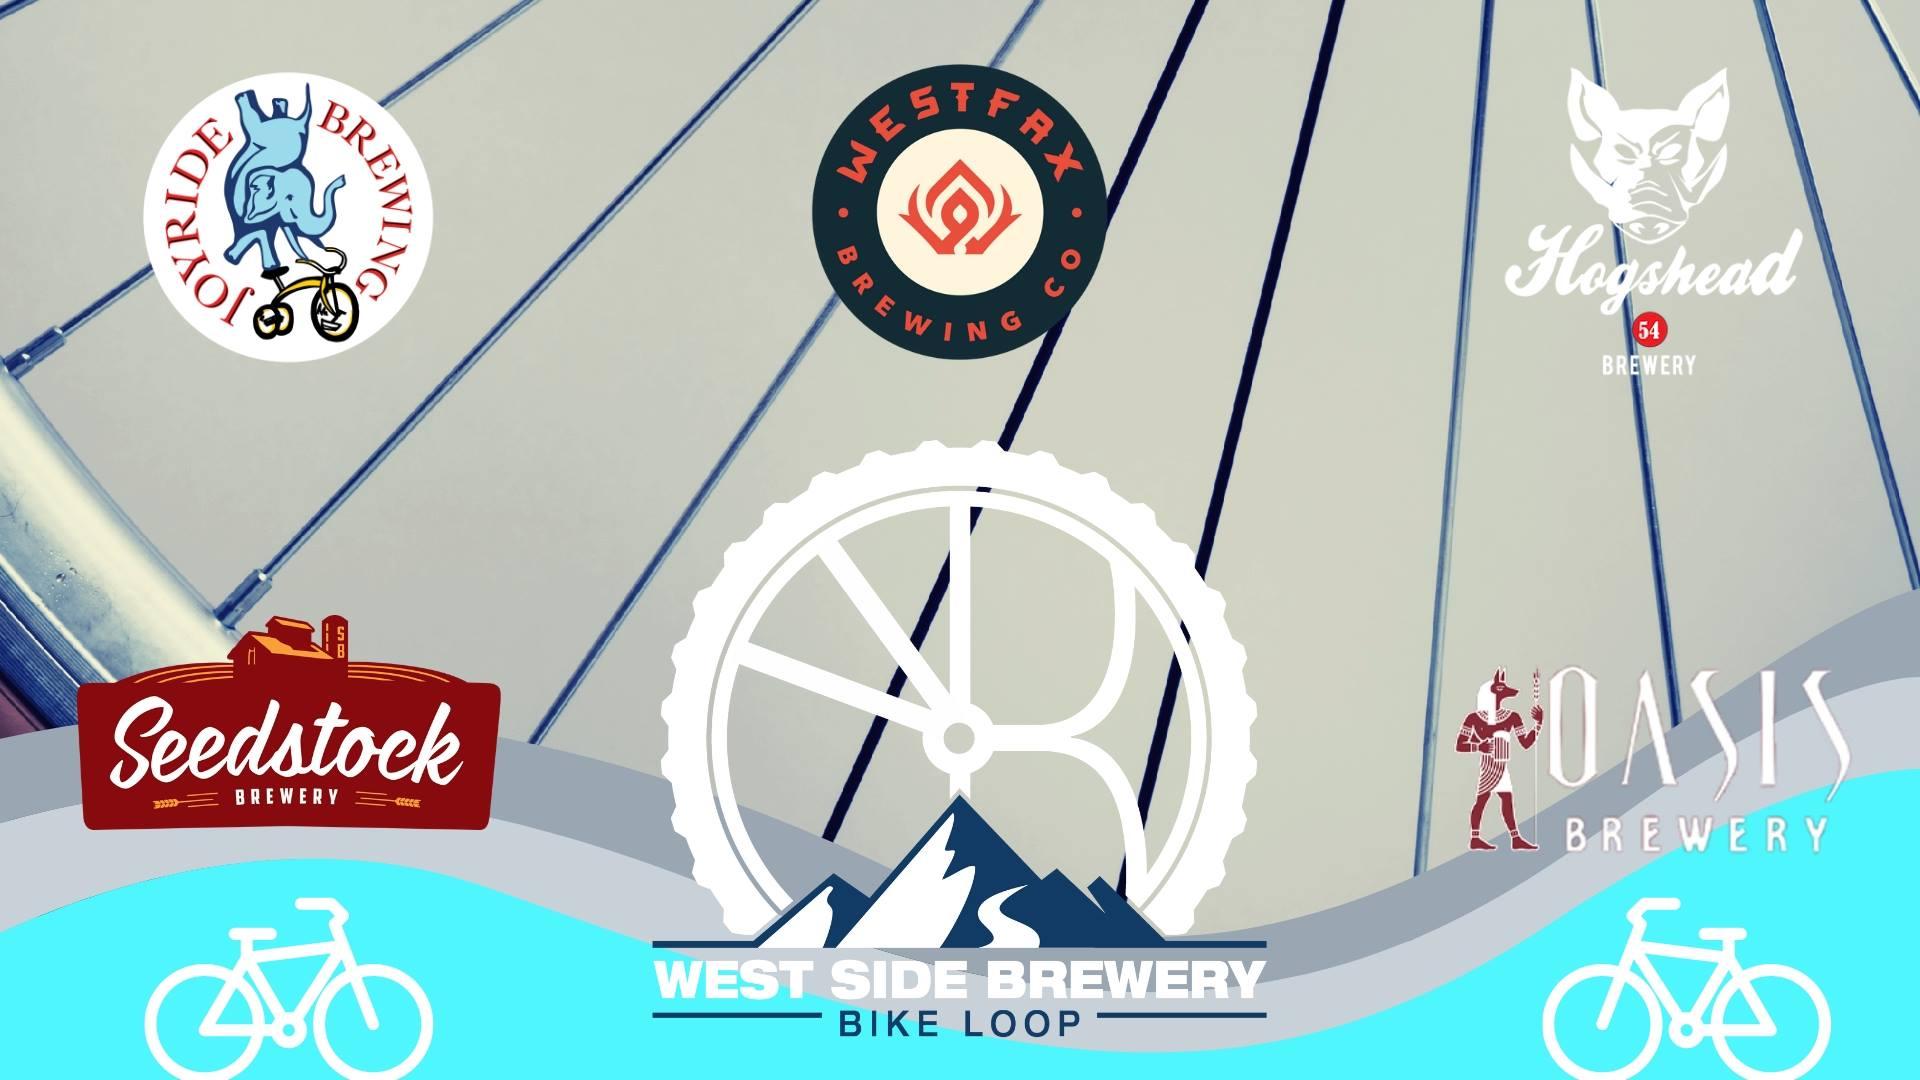 d08626c3bdc West Side Brewery Bike Loop   WestFax Brewing Company (Lakewood) – 6733 W  Colfax Ave